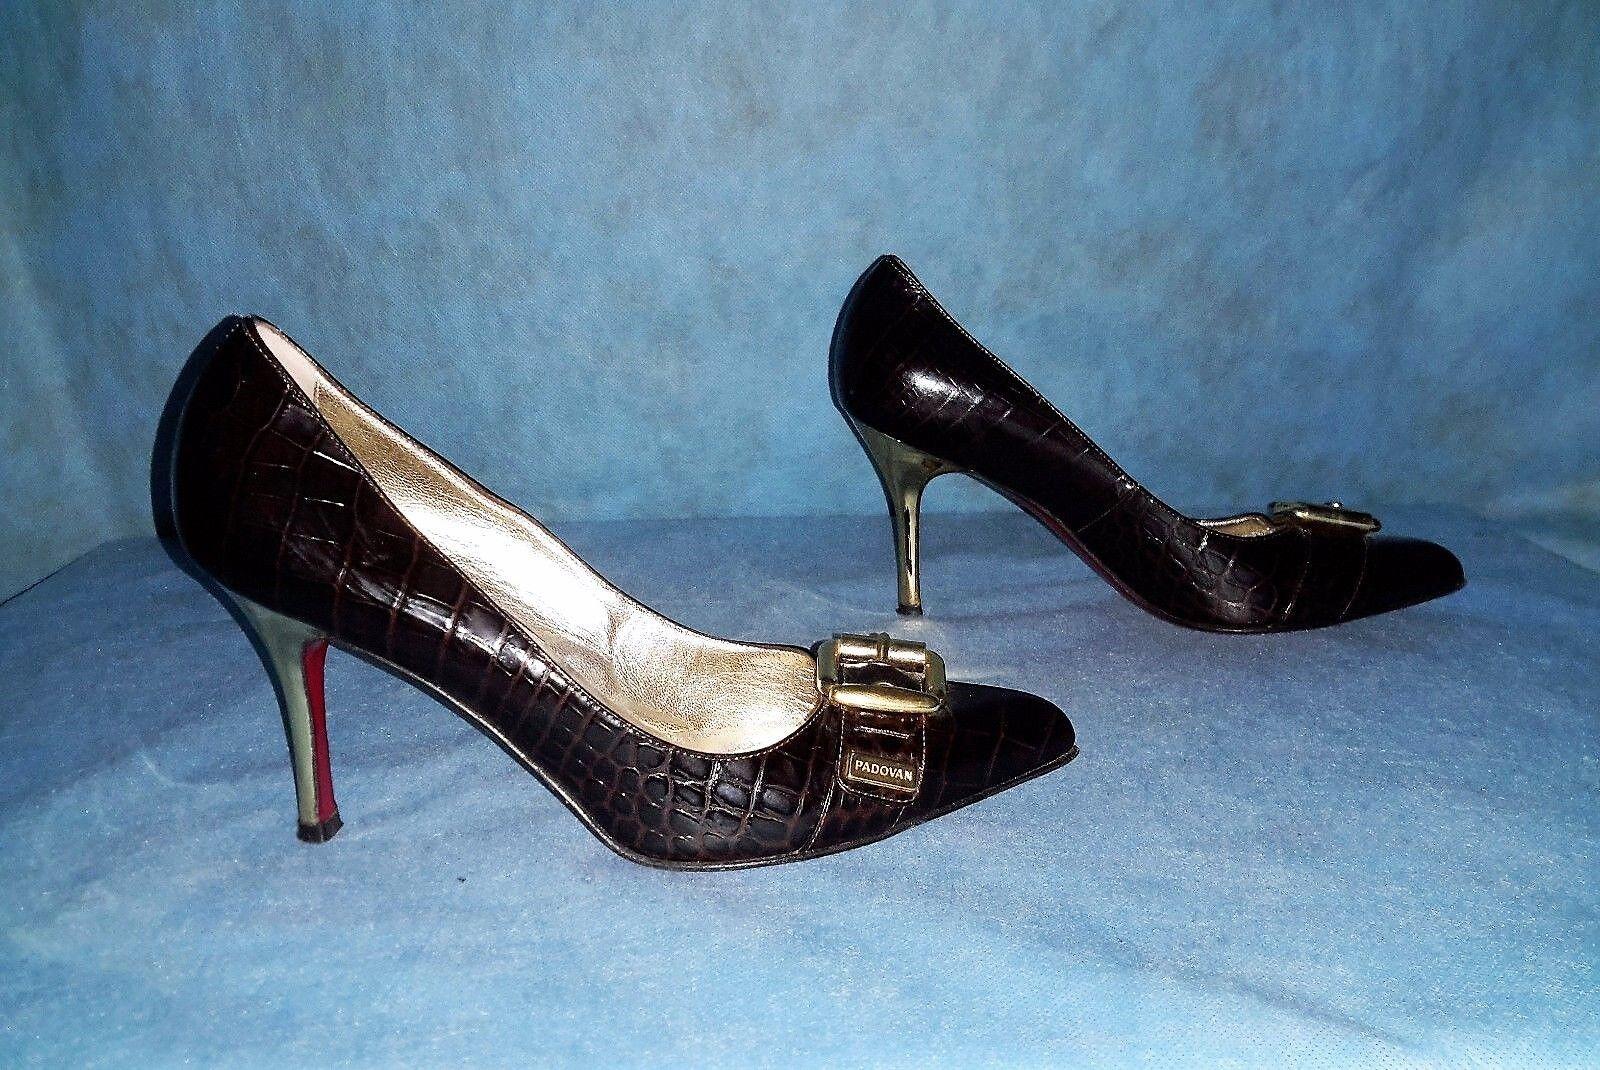 shoes escarpins LUCIANO PADOVAN tout cuir brown p 38 fr SUPER ETAT